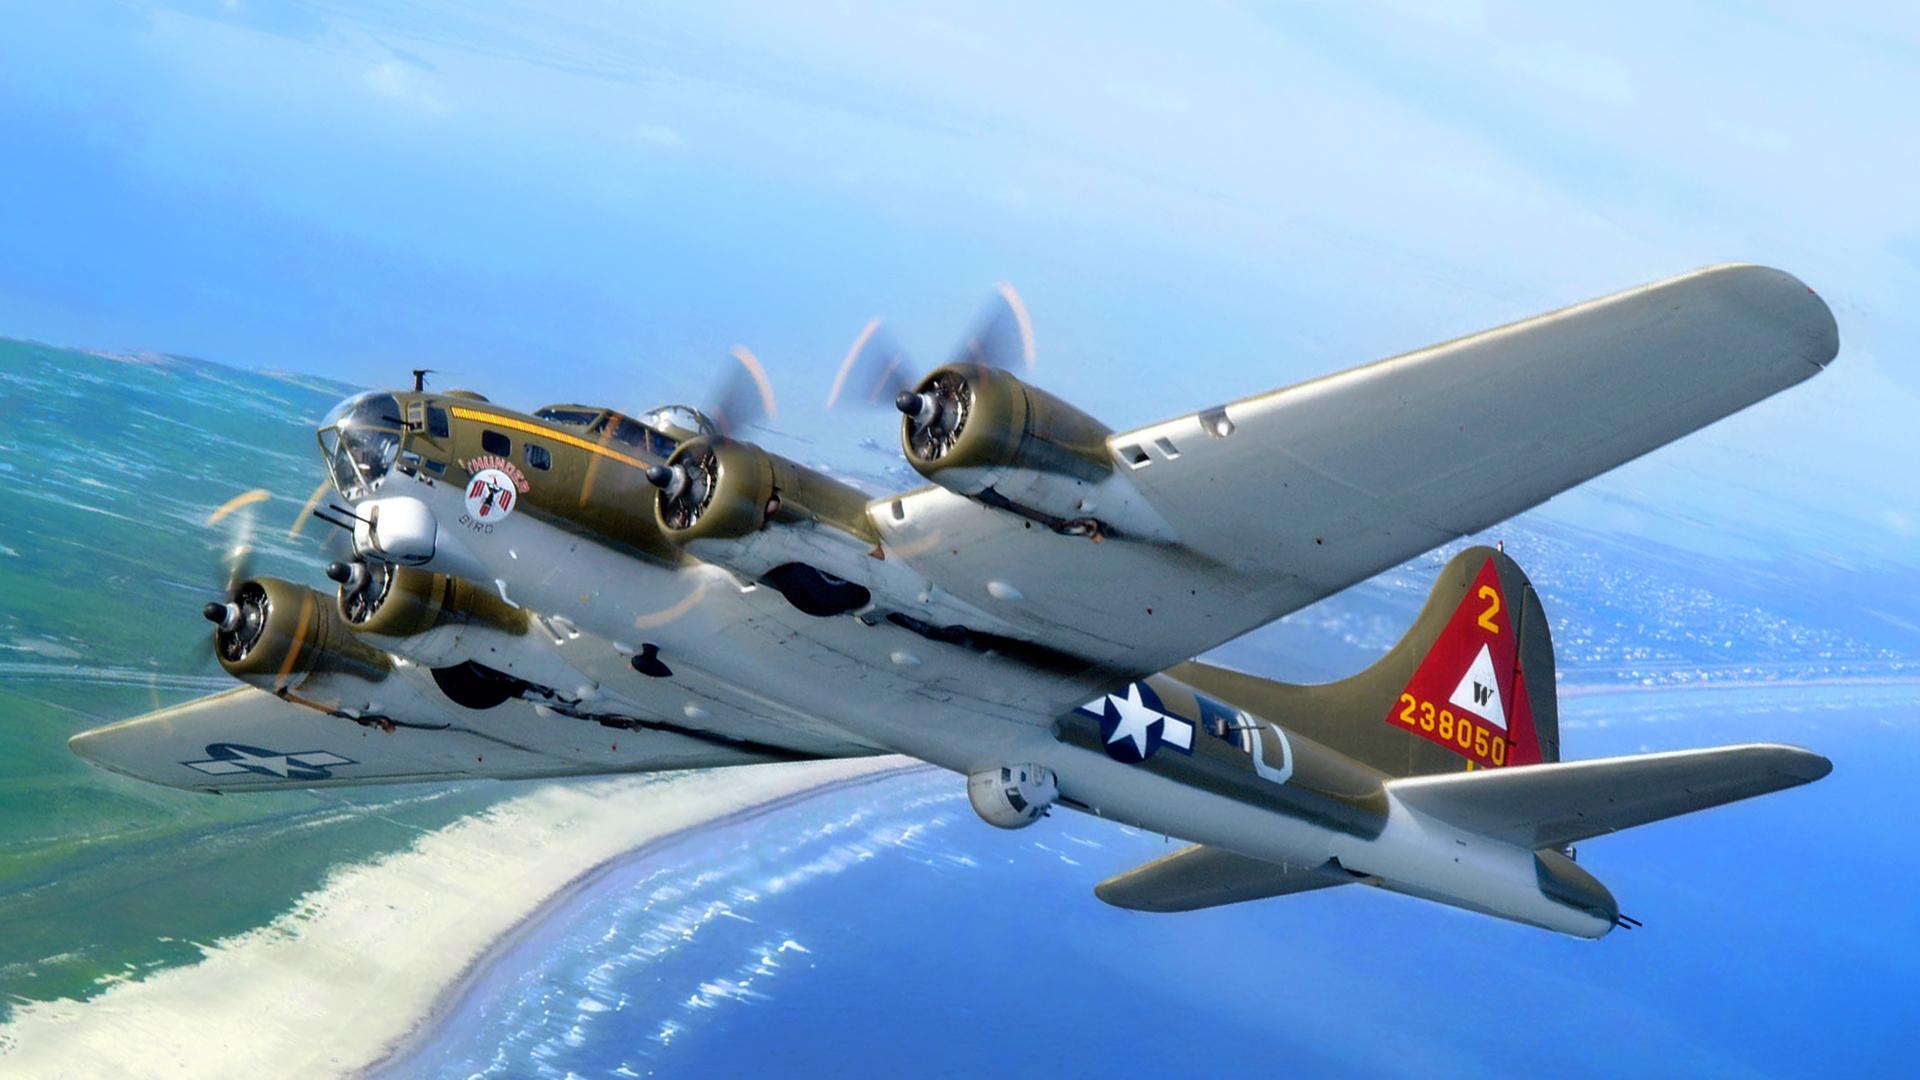 B 17 Flying Fortress Wallpaper Antique Aircraft HD Wa...